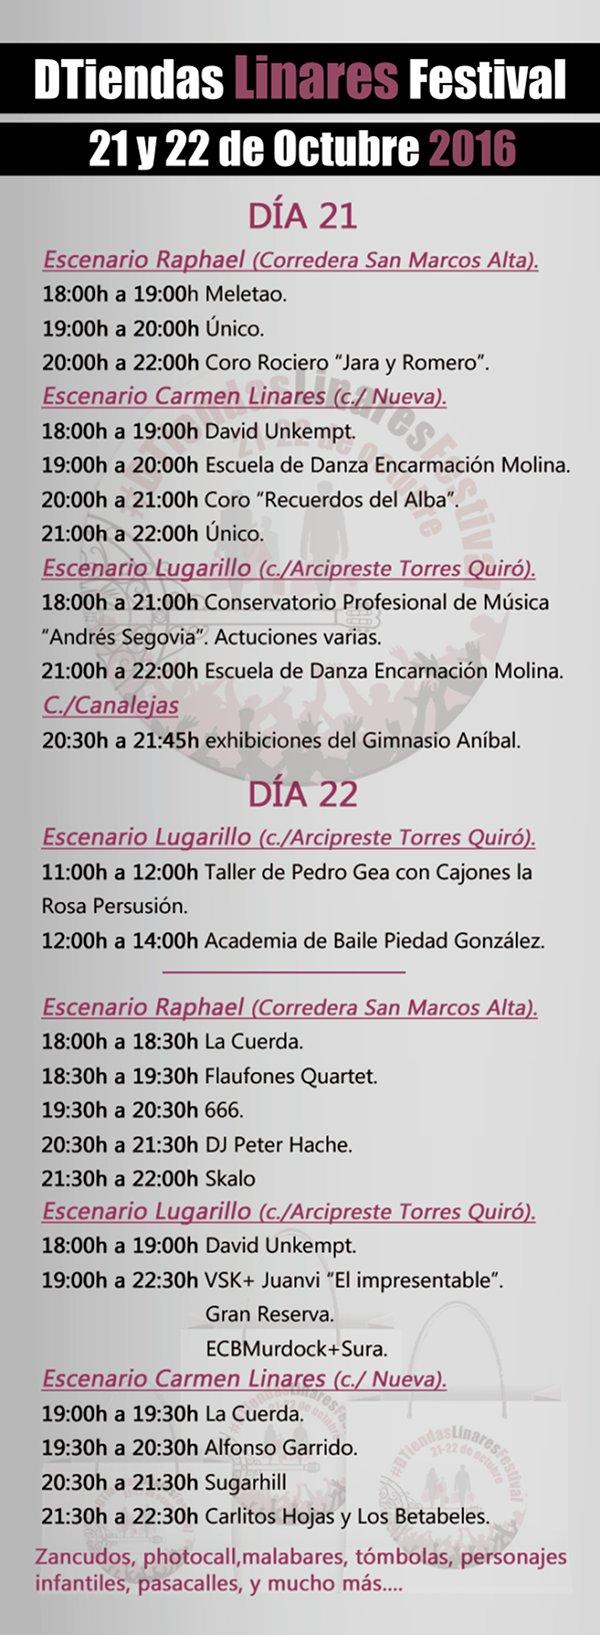 programacion-d-tiendas-linares-festival-20216